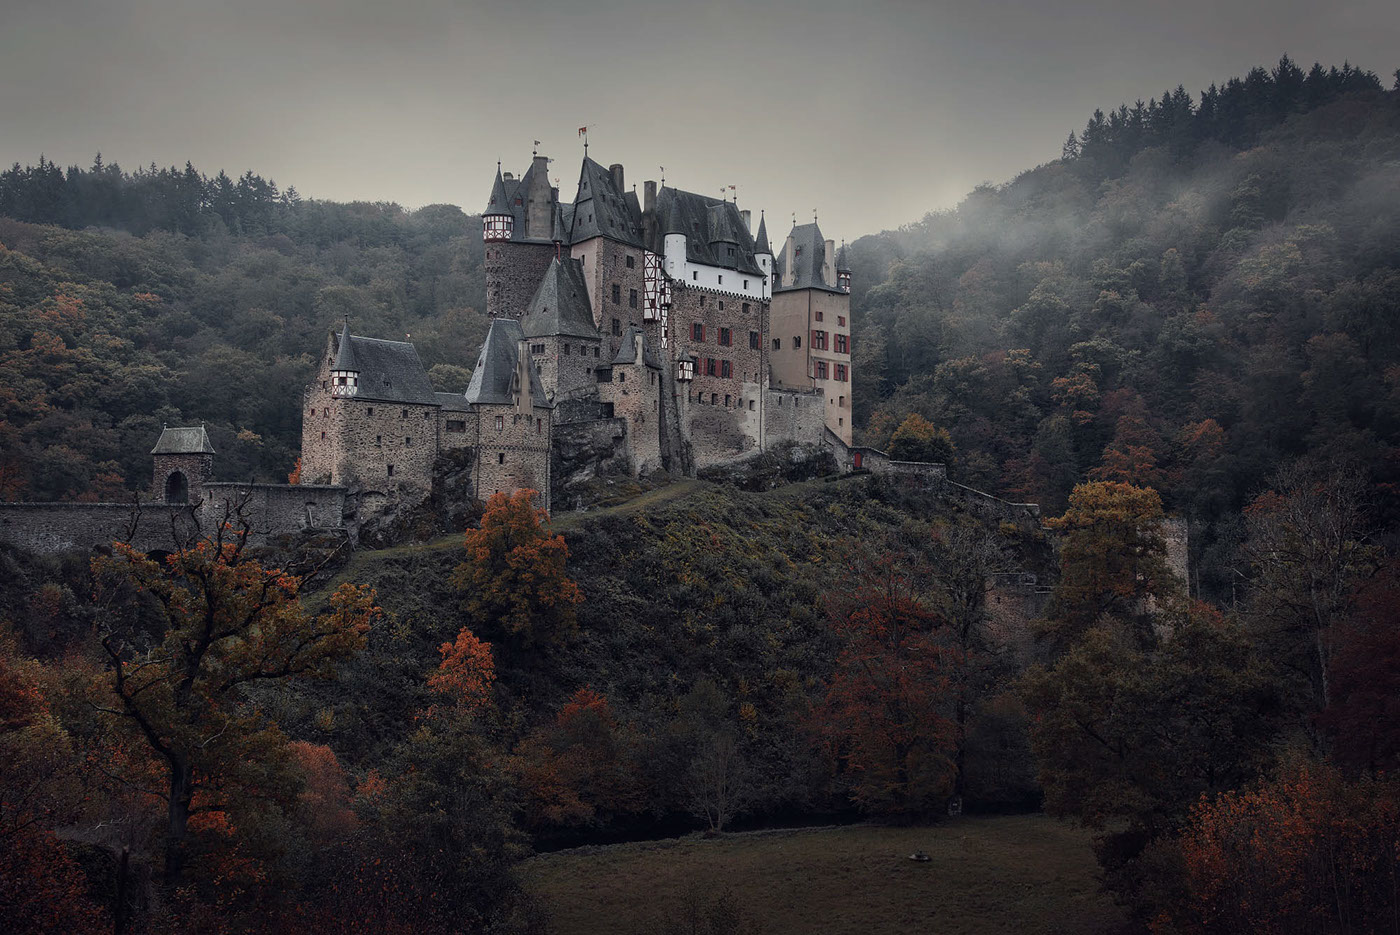 Fall 4k Wallpaper Burg Eltz On Behance